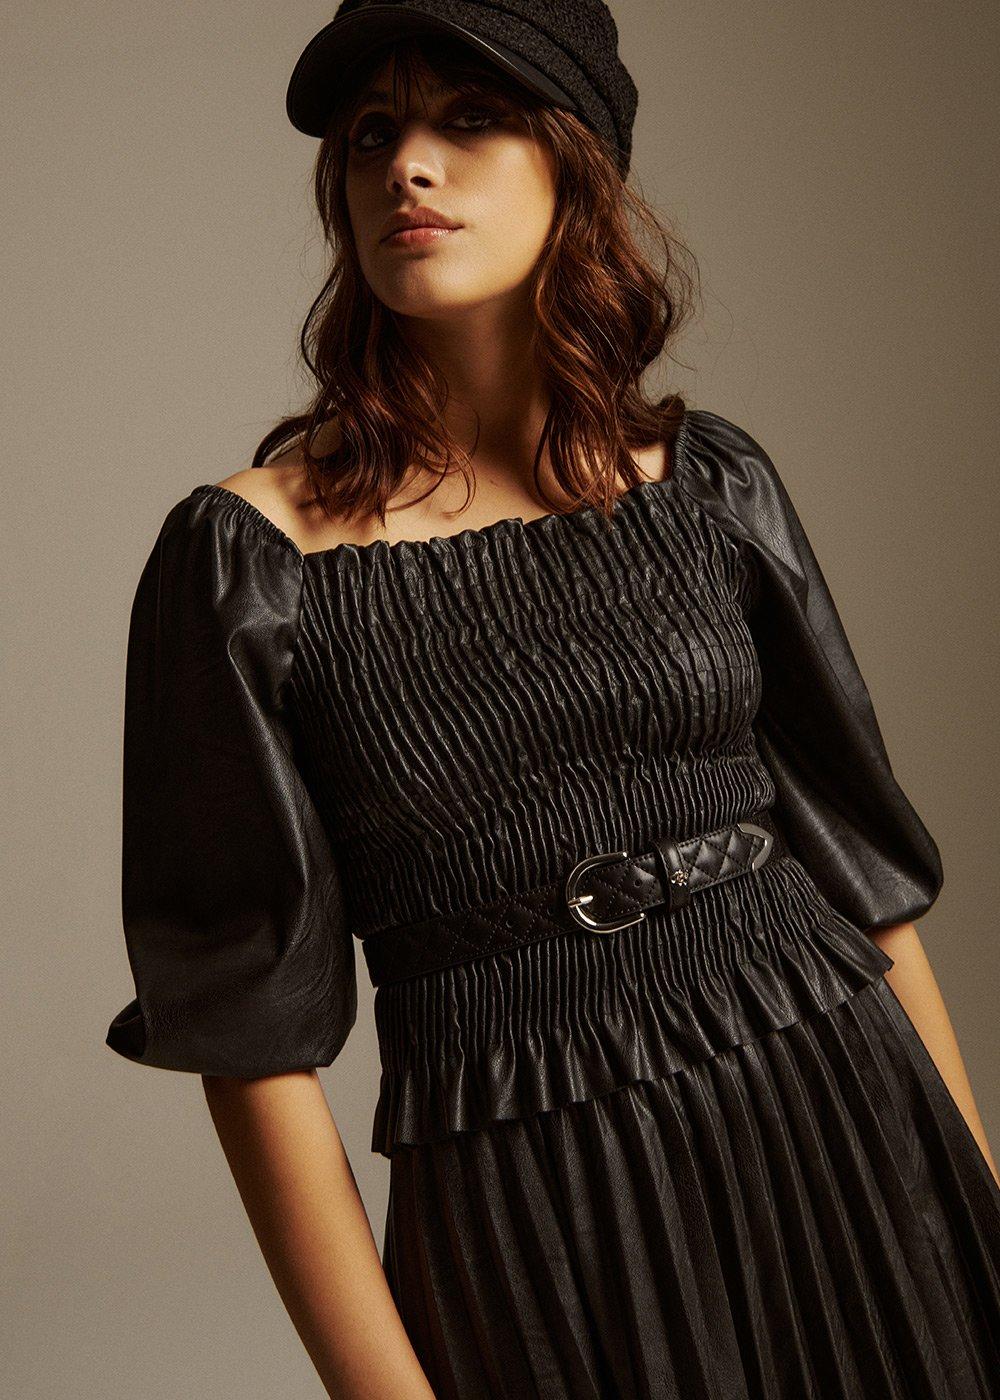 Serena Eco-leather T-shirt - Black - Woman